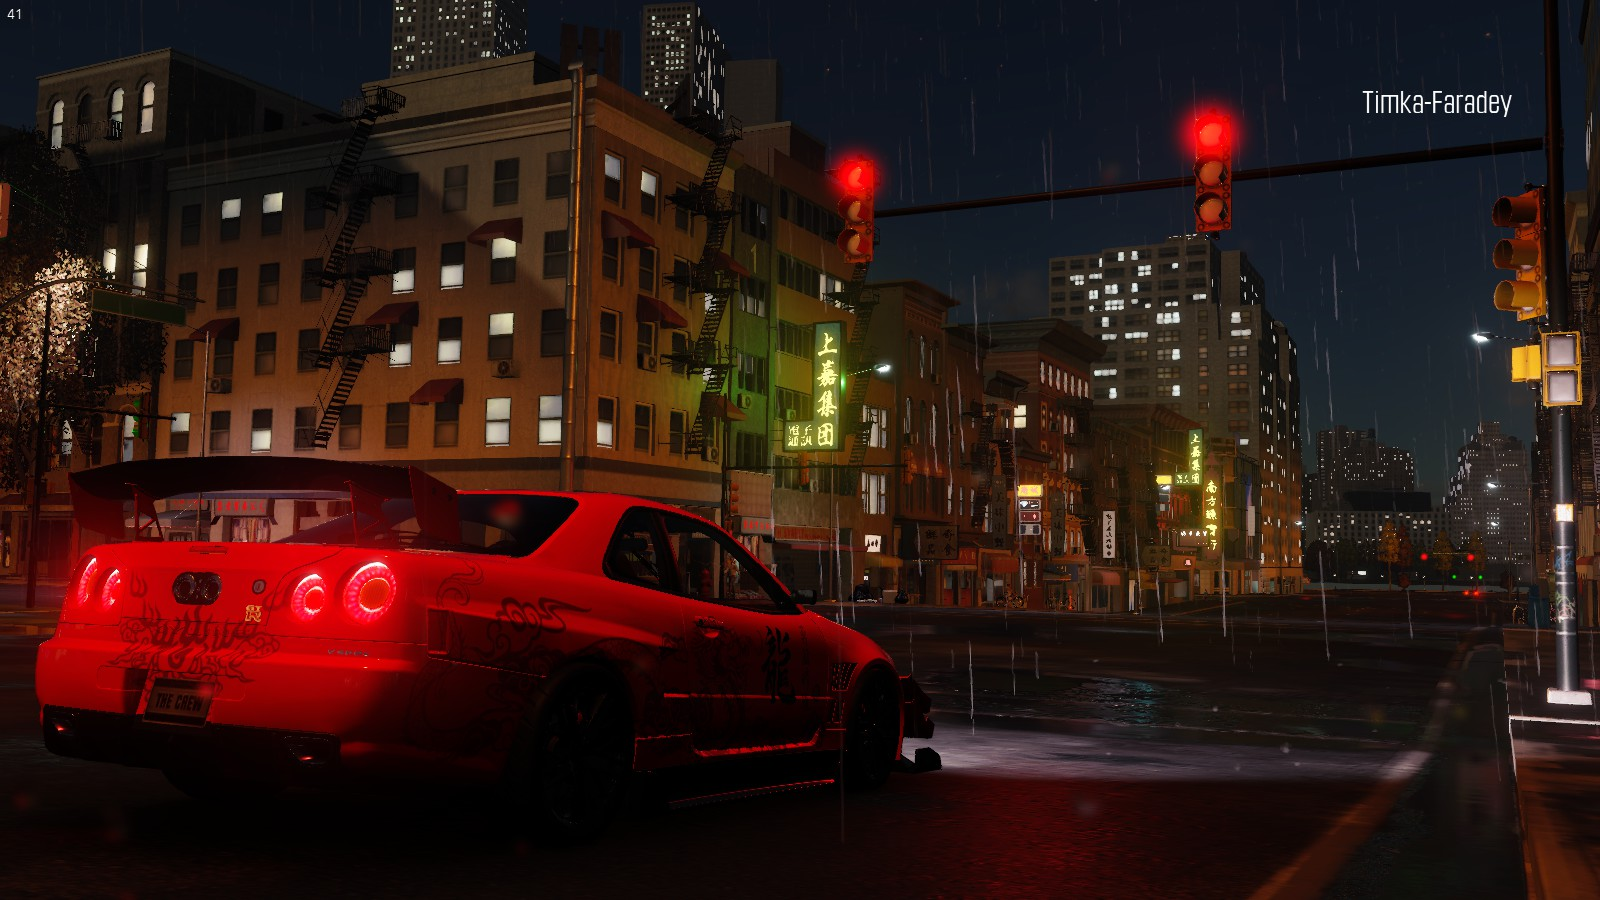 Nissan Skyline R34 GT-R - Crew, the GTR, Автомобиль, Транспорт, Япония